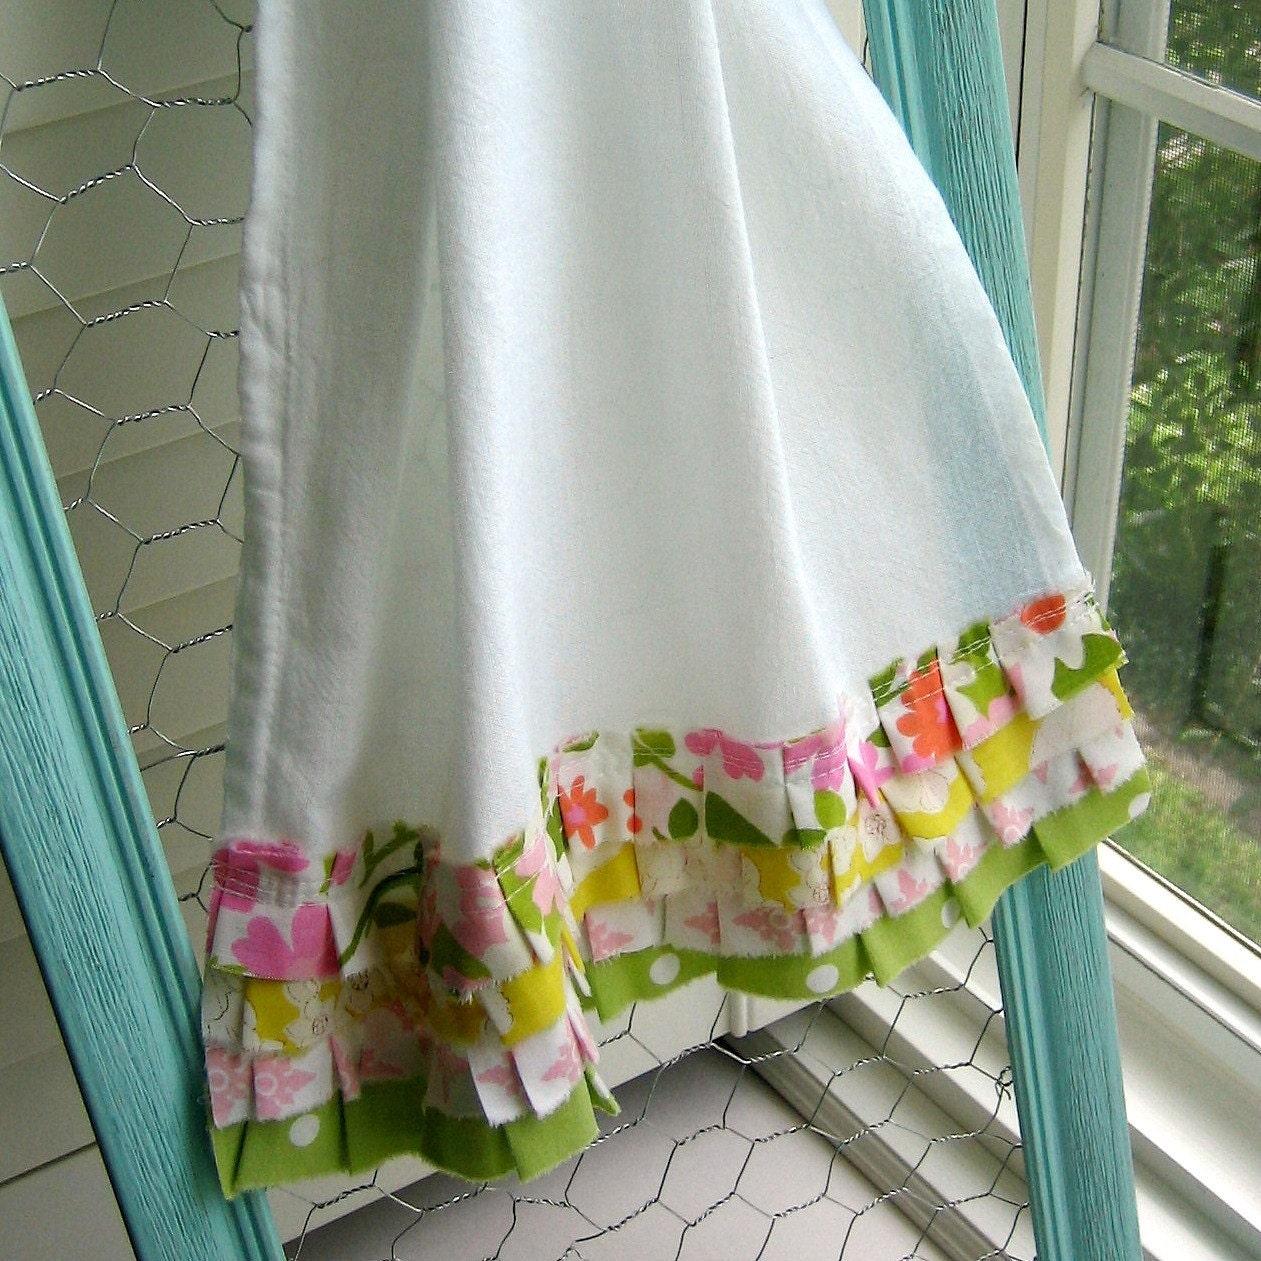 Dish Towel In: Flour Sack Dish Towel Ruffle Kitchen Towel Tea Towel Dish